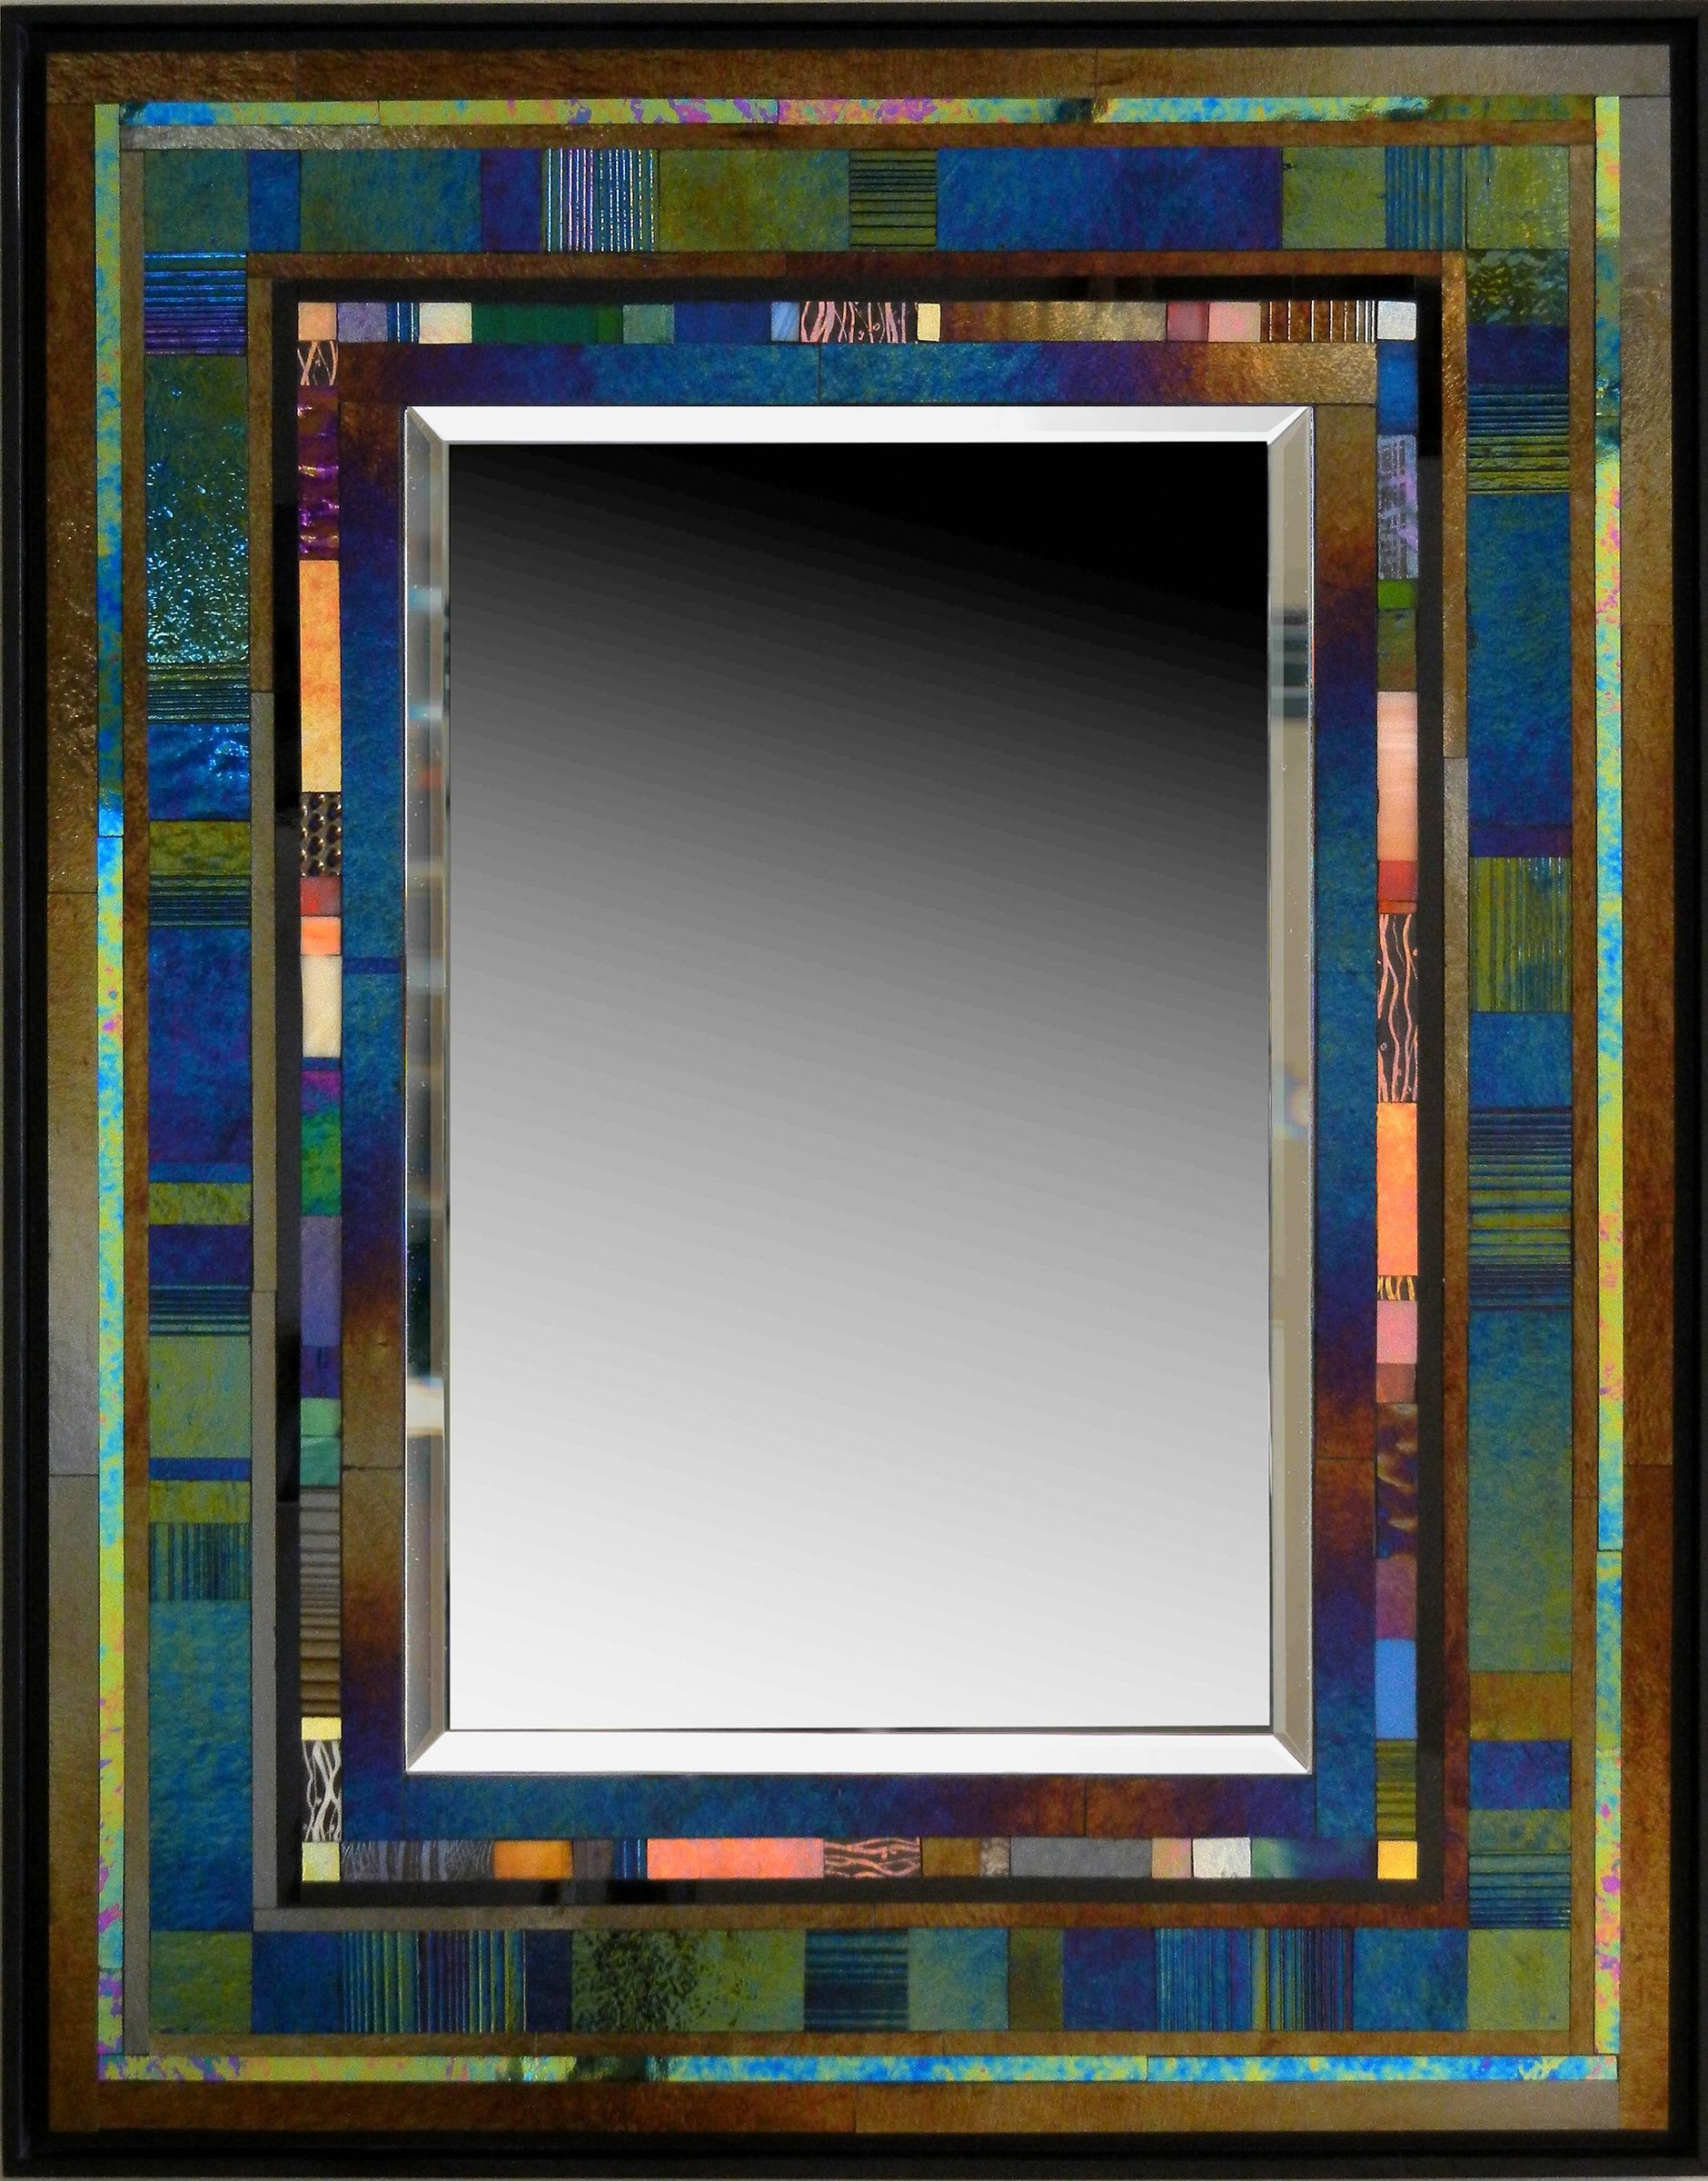 Jazz ii by thomas meyers art glass mirror artful home for Tall glass mirror